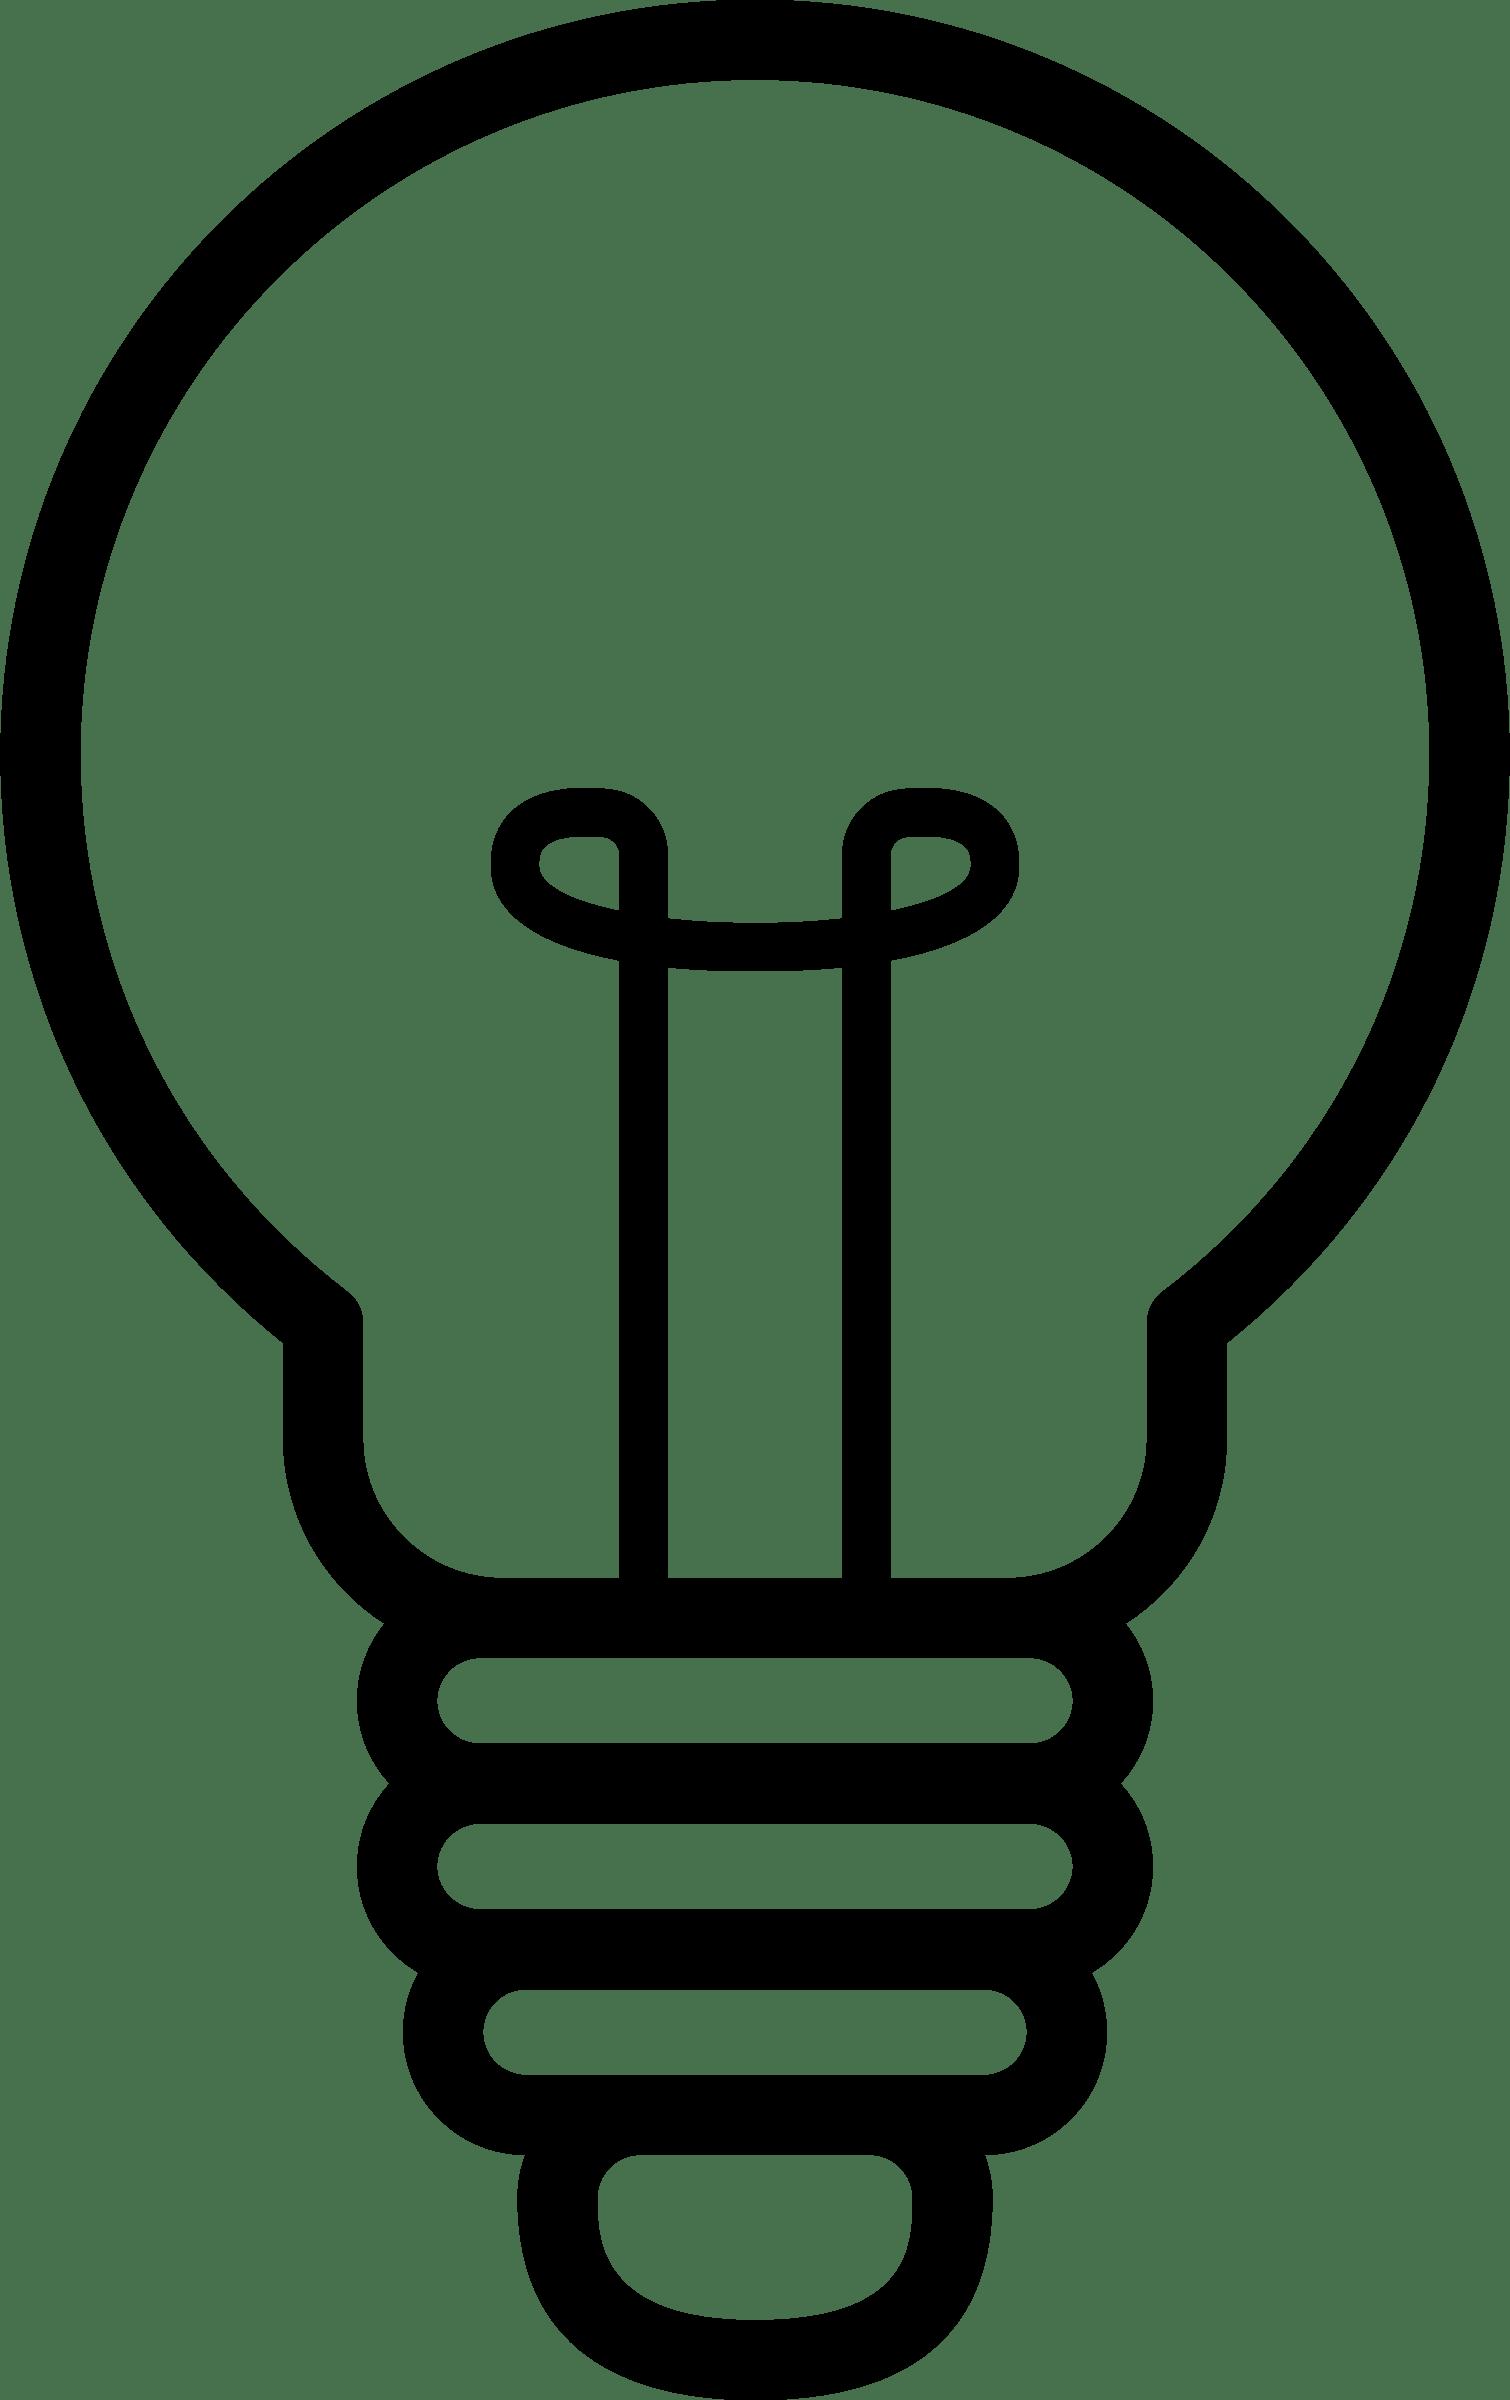 Lightbulb Clipart Growth Mindset Lightbulb Growth Mindset